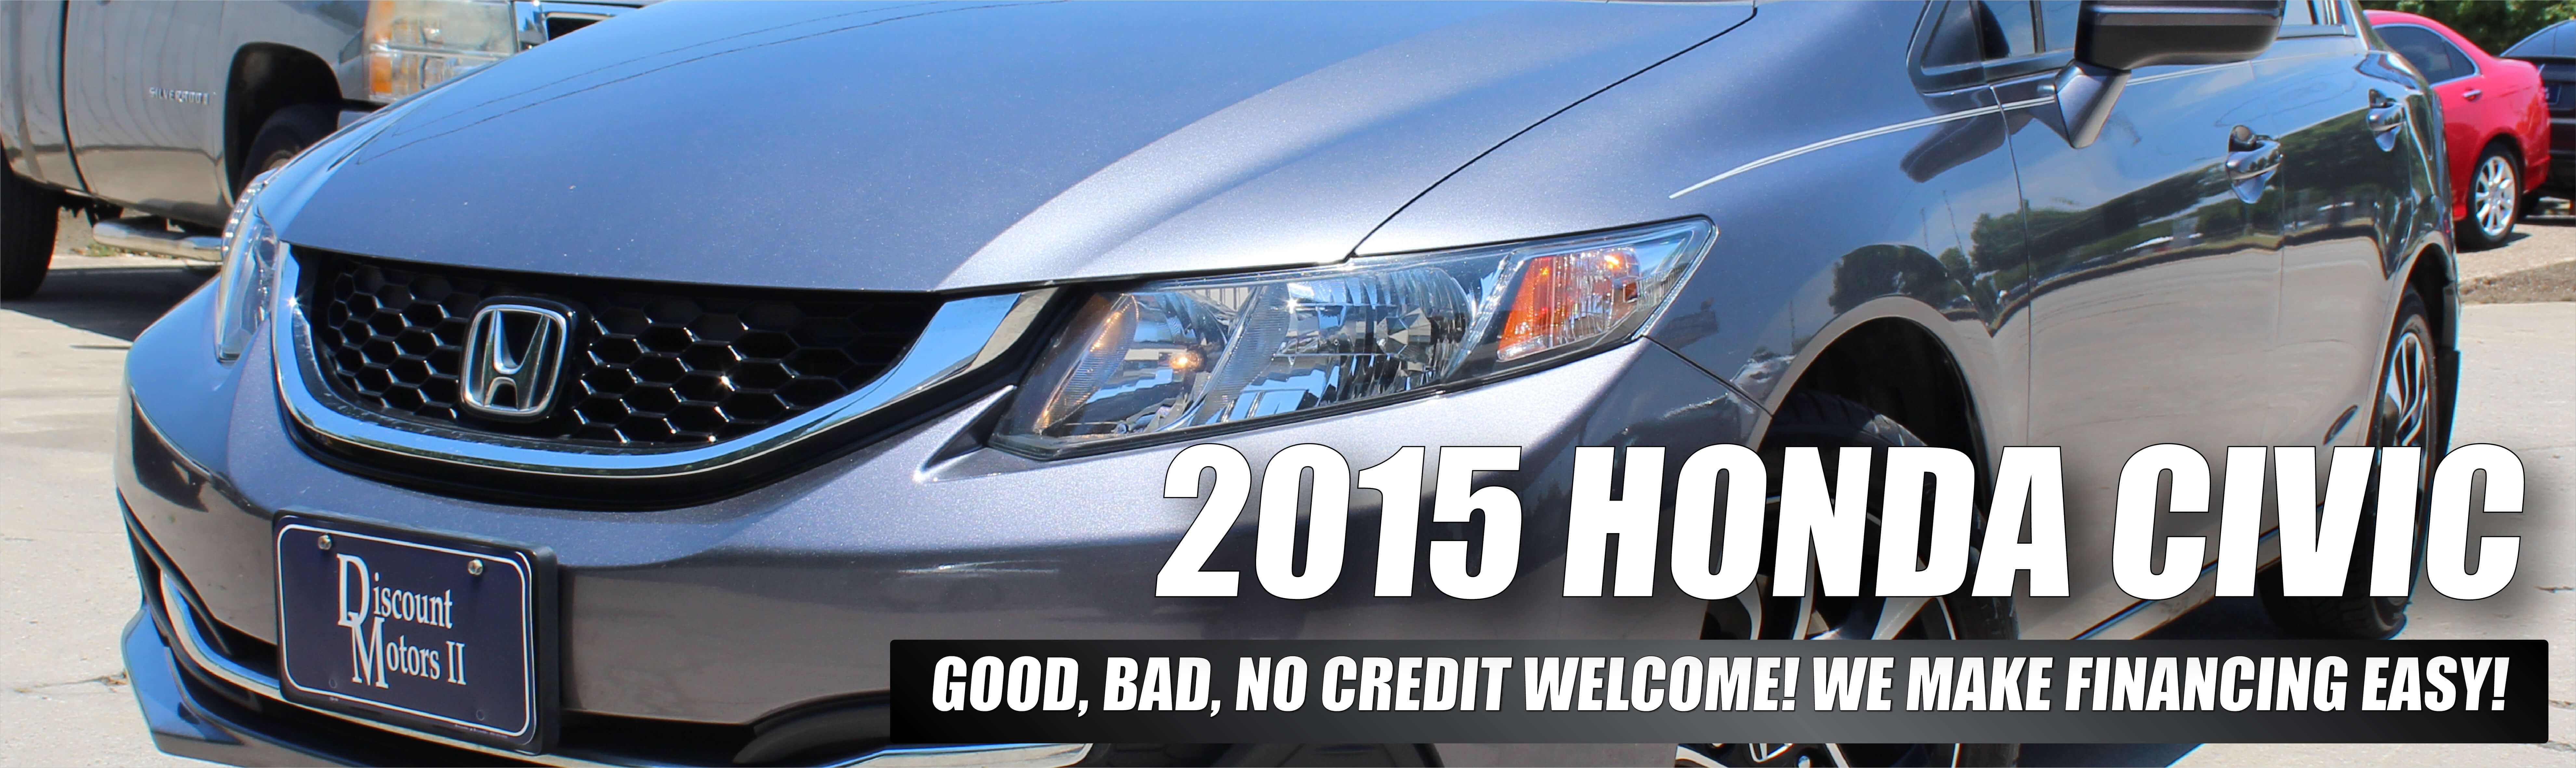 Discount Motors BEST IN TEXAS a Used Car Dealership in Arlington